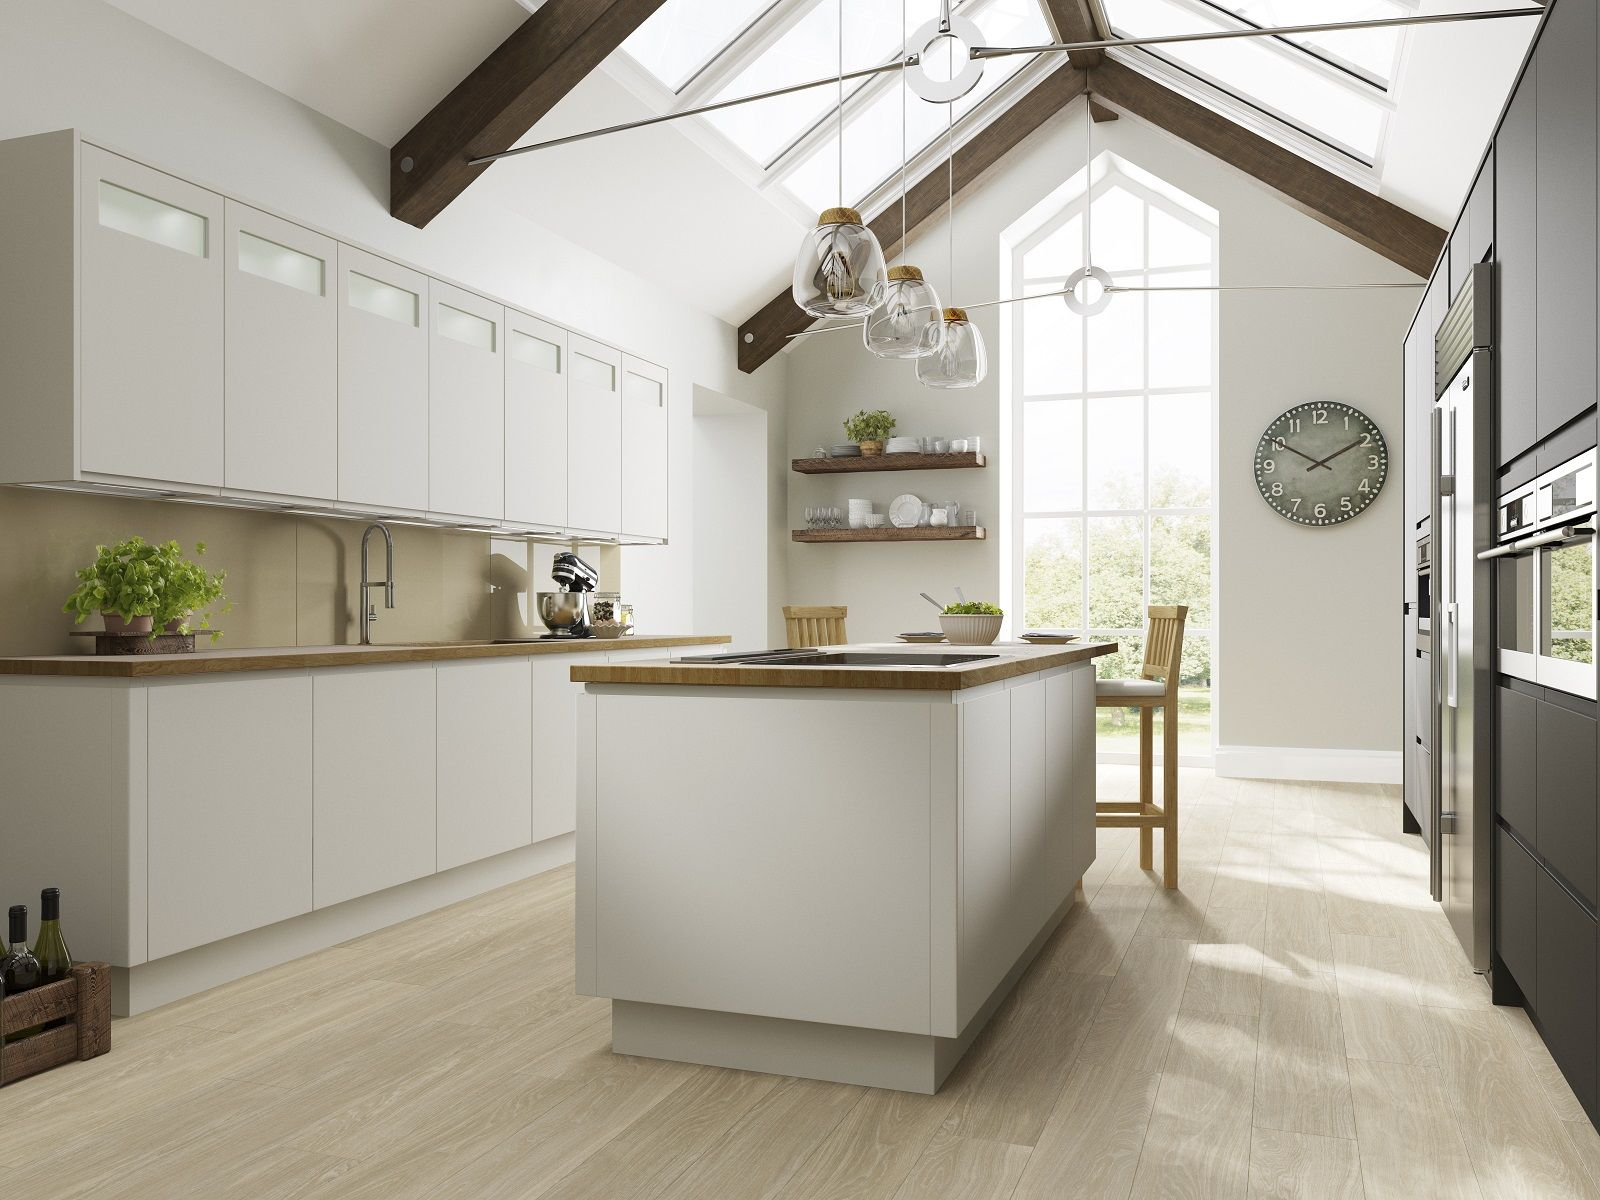 Hehku Kitchens  Visit Our Hehku Kitchen Showroom For Kitchen Enchanting Kitchen Design And Installation Decorating Inspiration